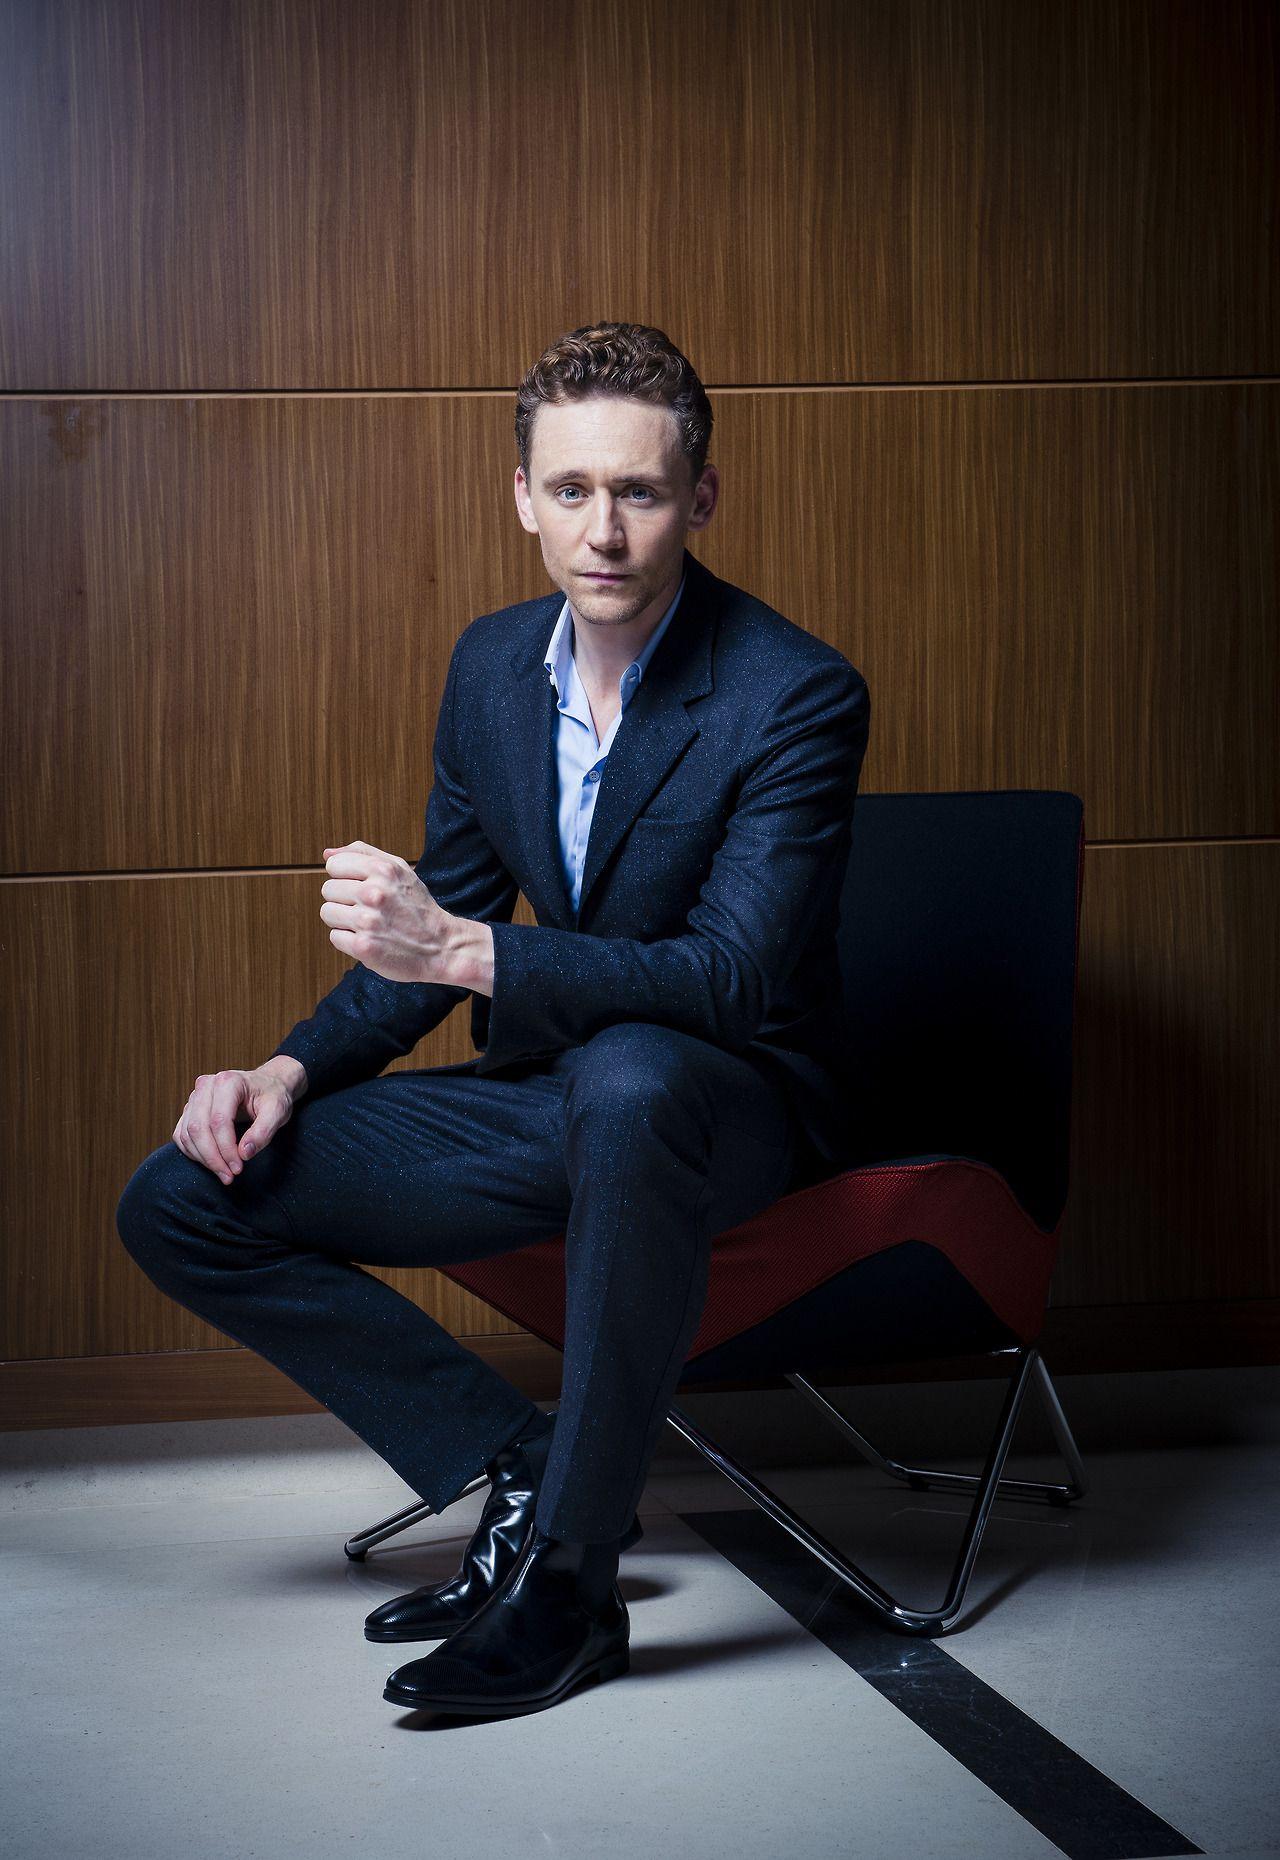 Tom Hiddleston in Seoul. Via Torrilla.tumblr.com